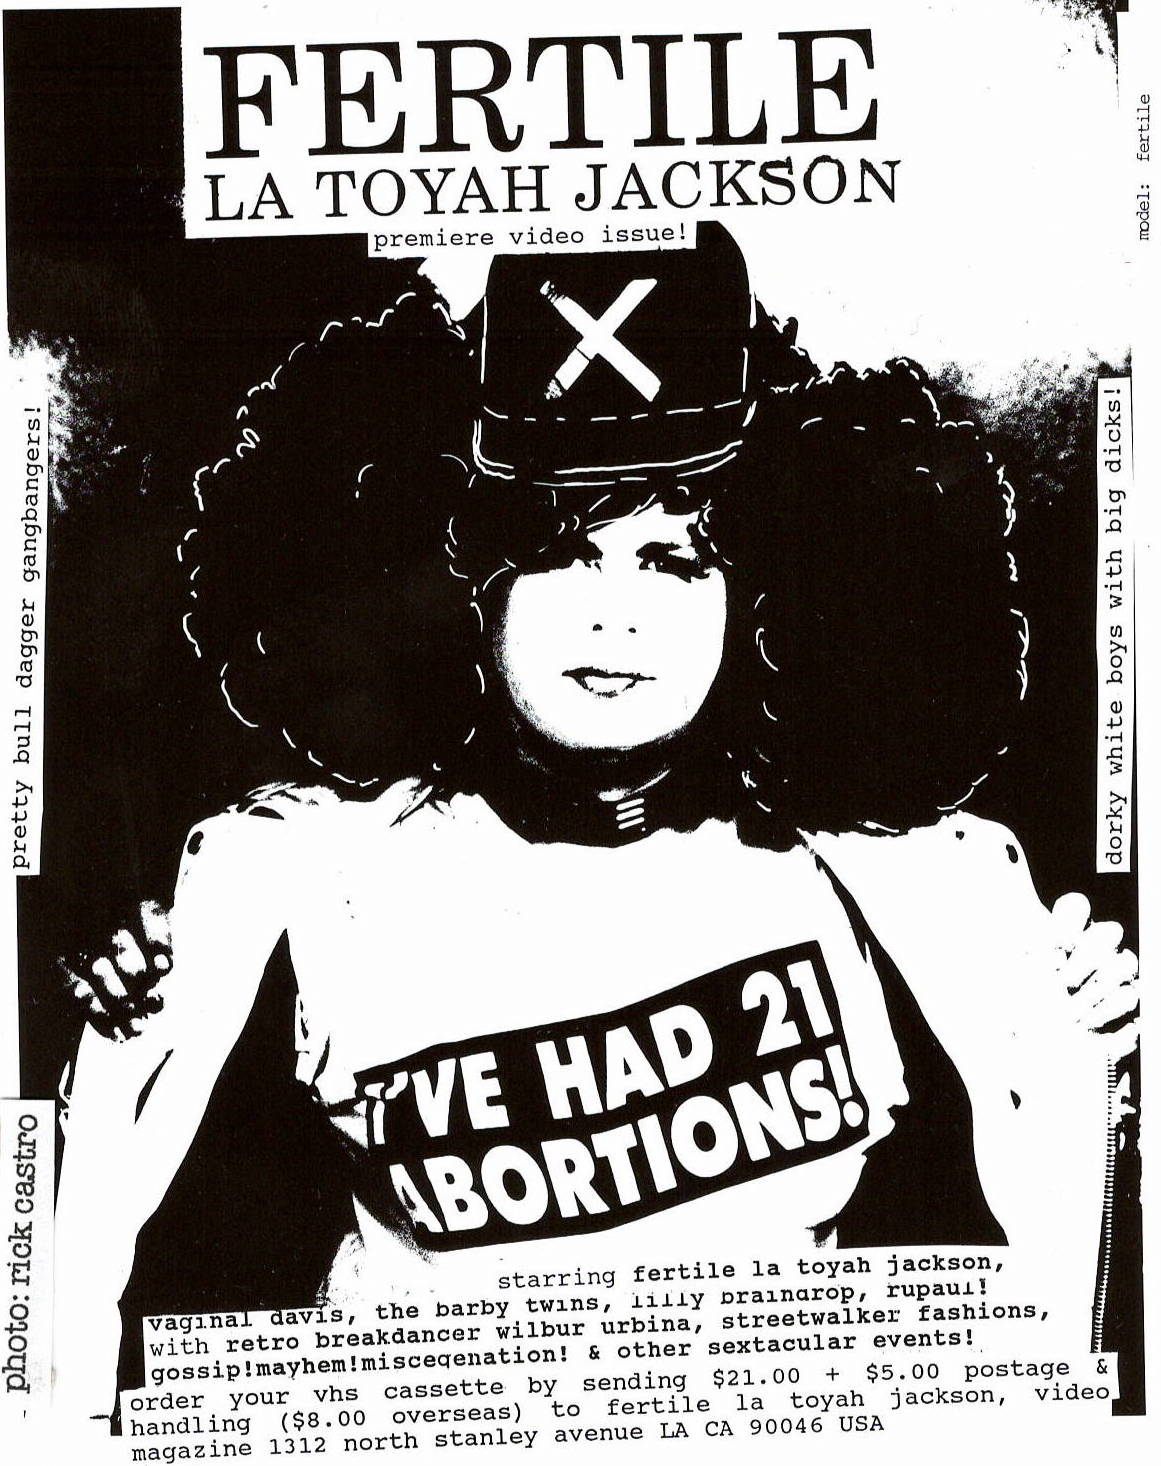 Fertile La Toyah Jackson